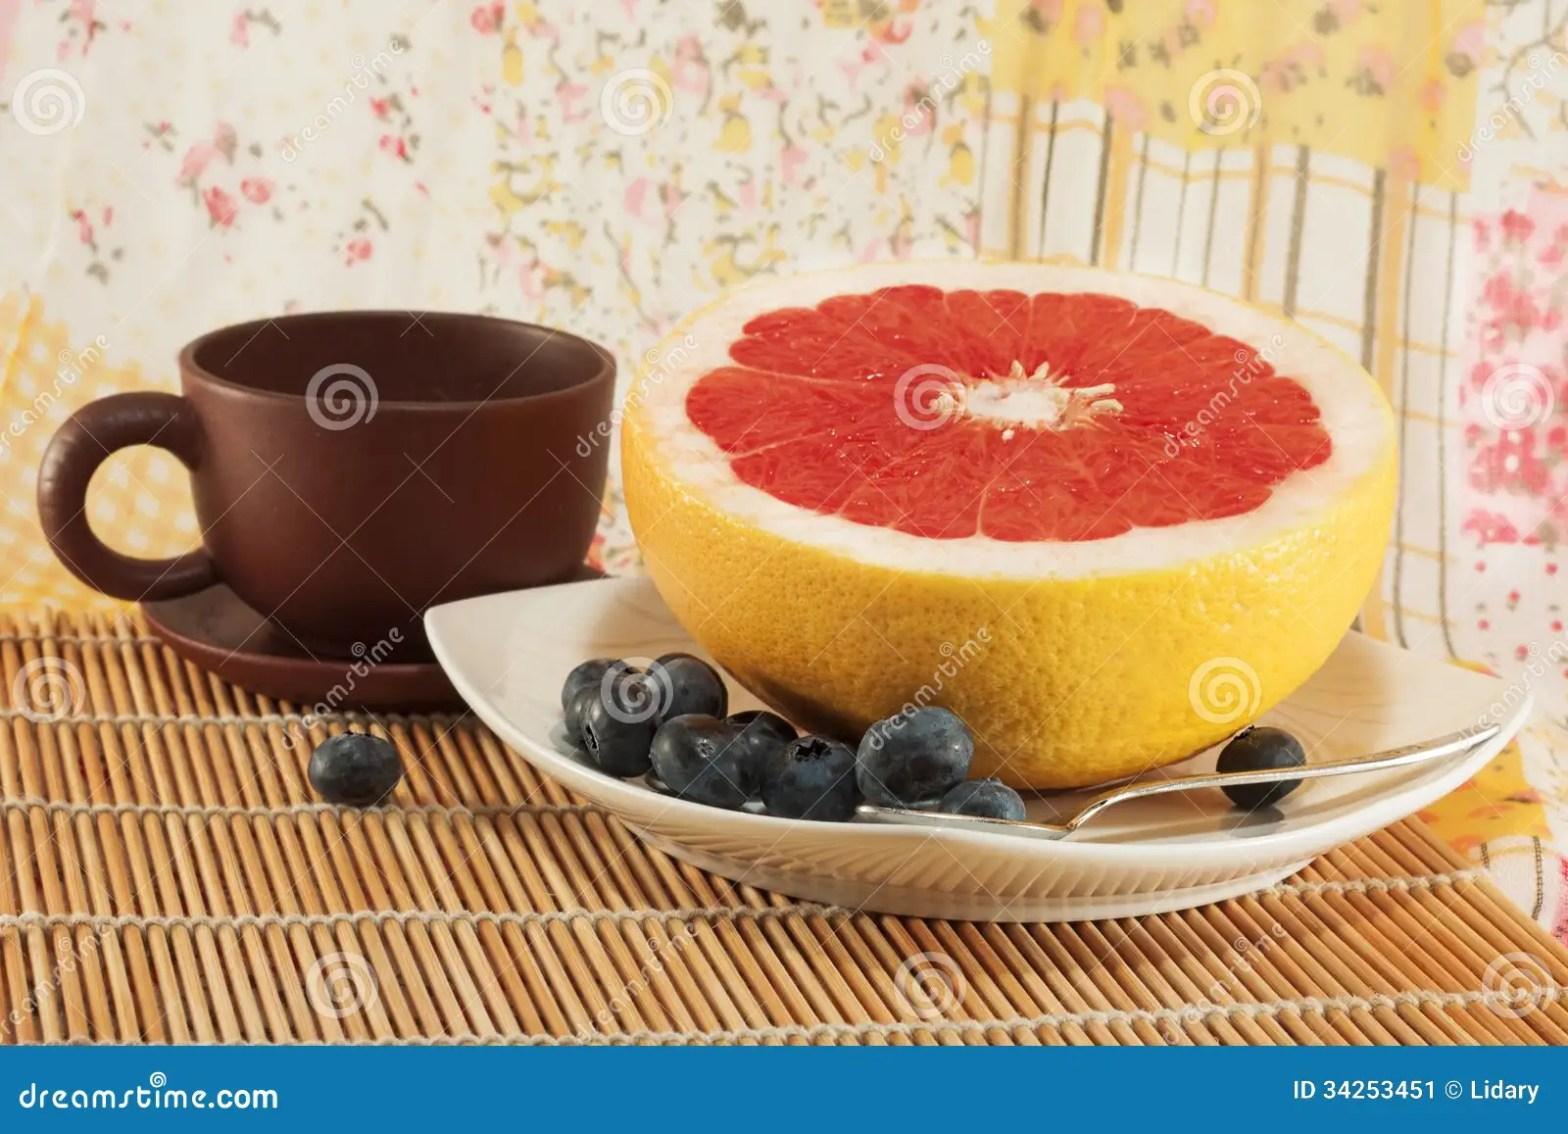 Still Life With A Diet Breakfast Grapefruit Blueberries